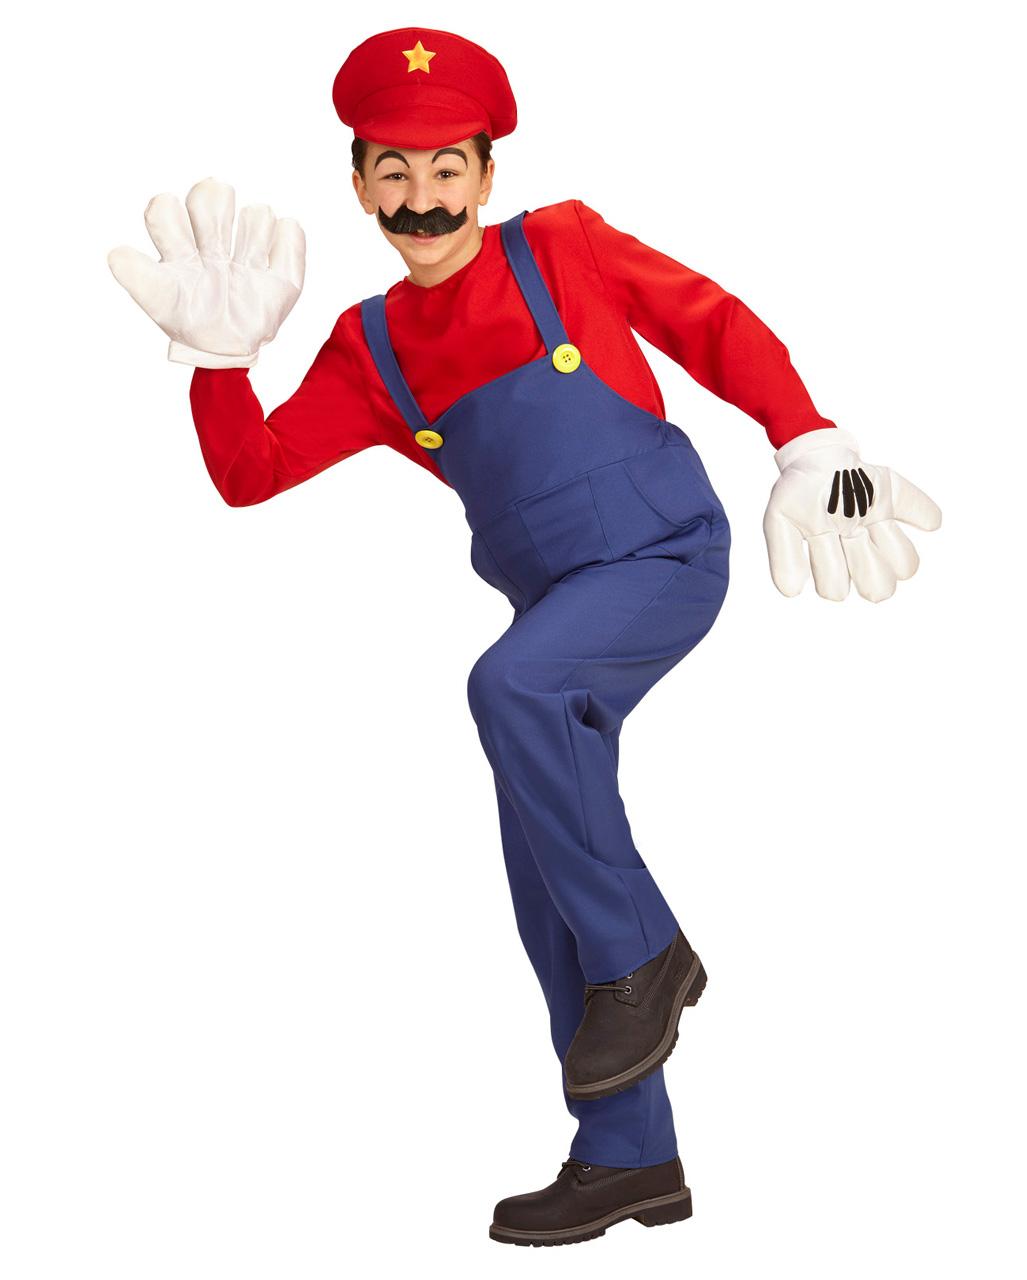 Faschingskostüm Erwachsene Mariokostüm rot-blau Klempner Super Mario Handwerker